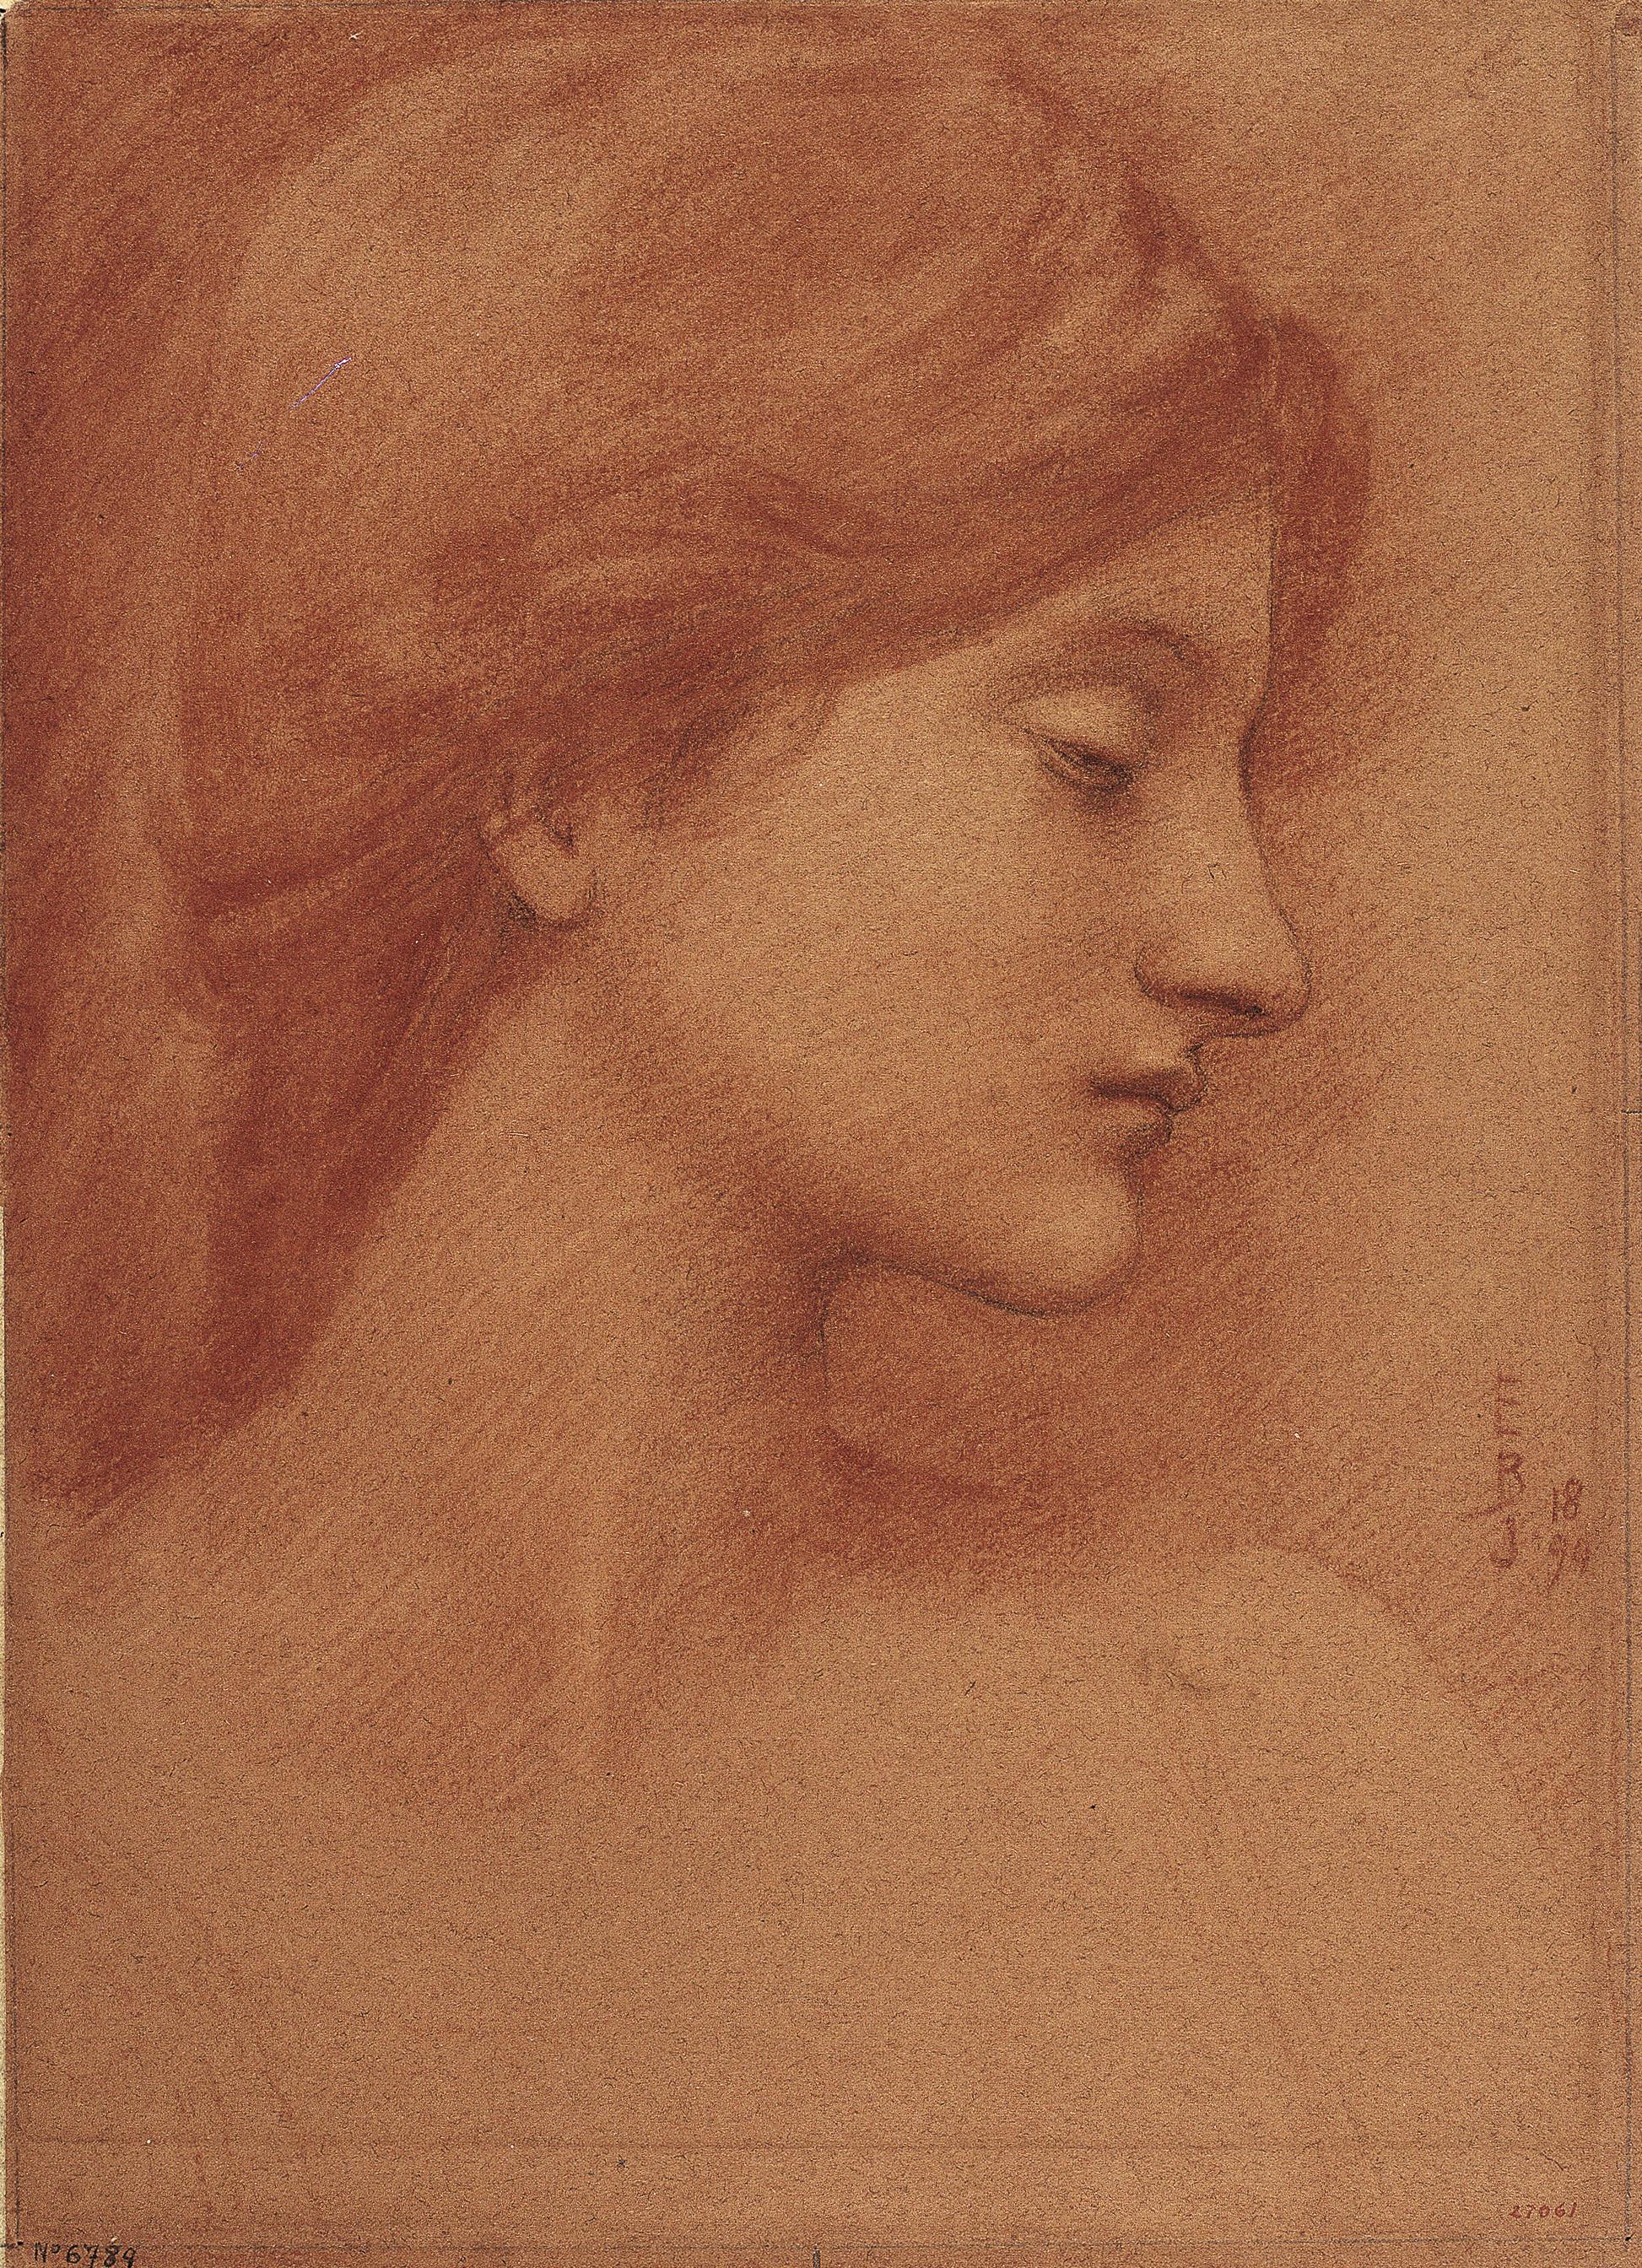 Edward Burne-Jones, Study of a Female Head, 1894